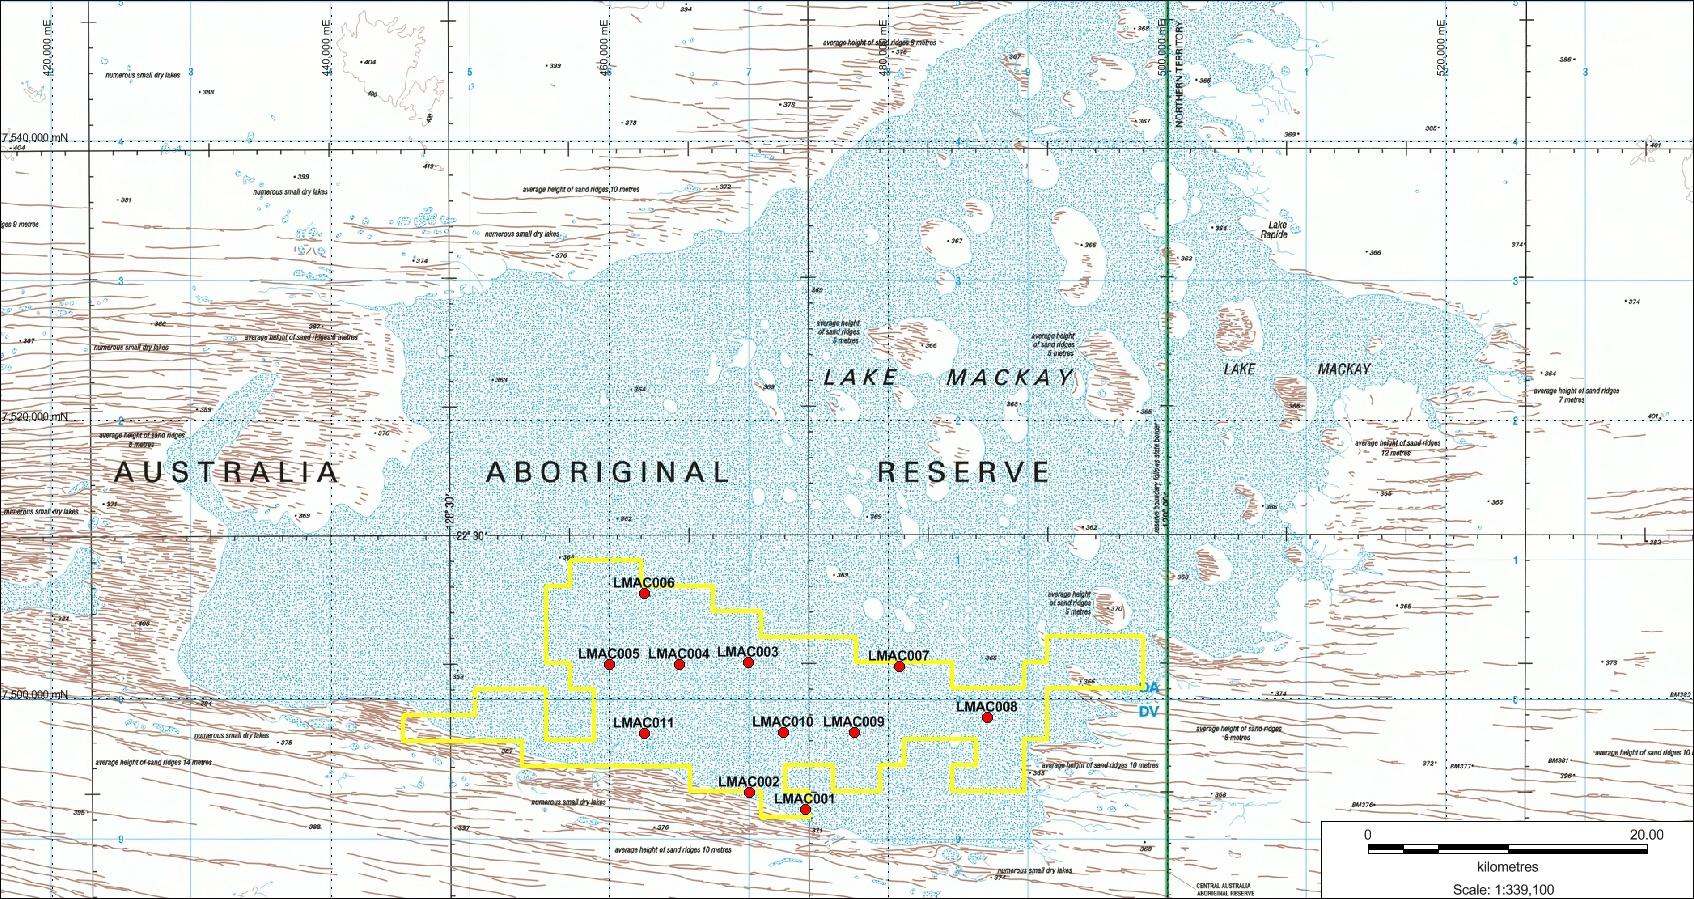 Lake Mackay JV Area